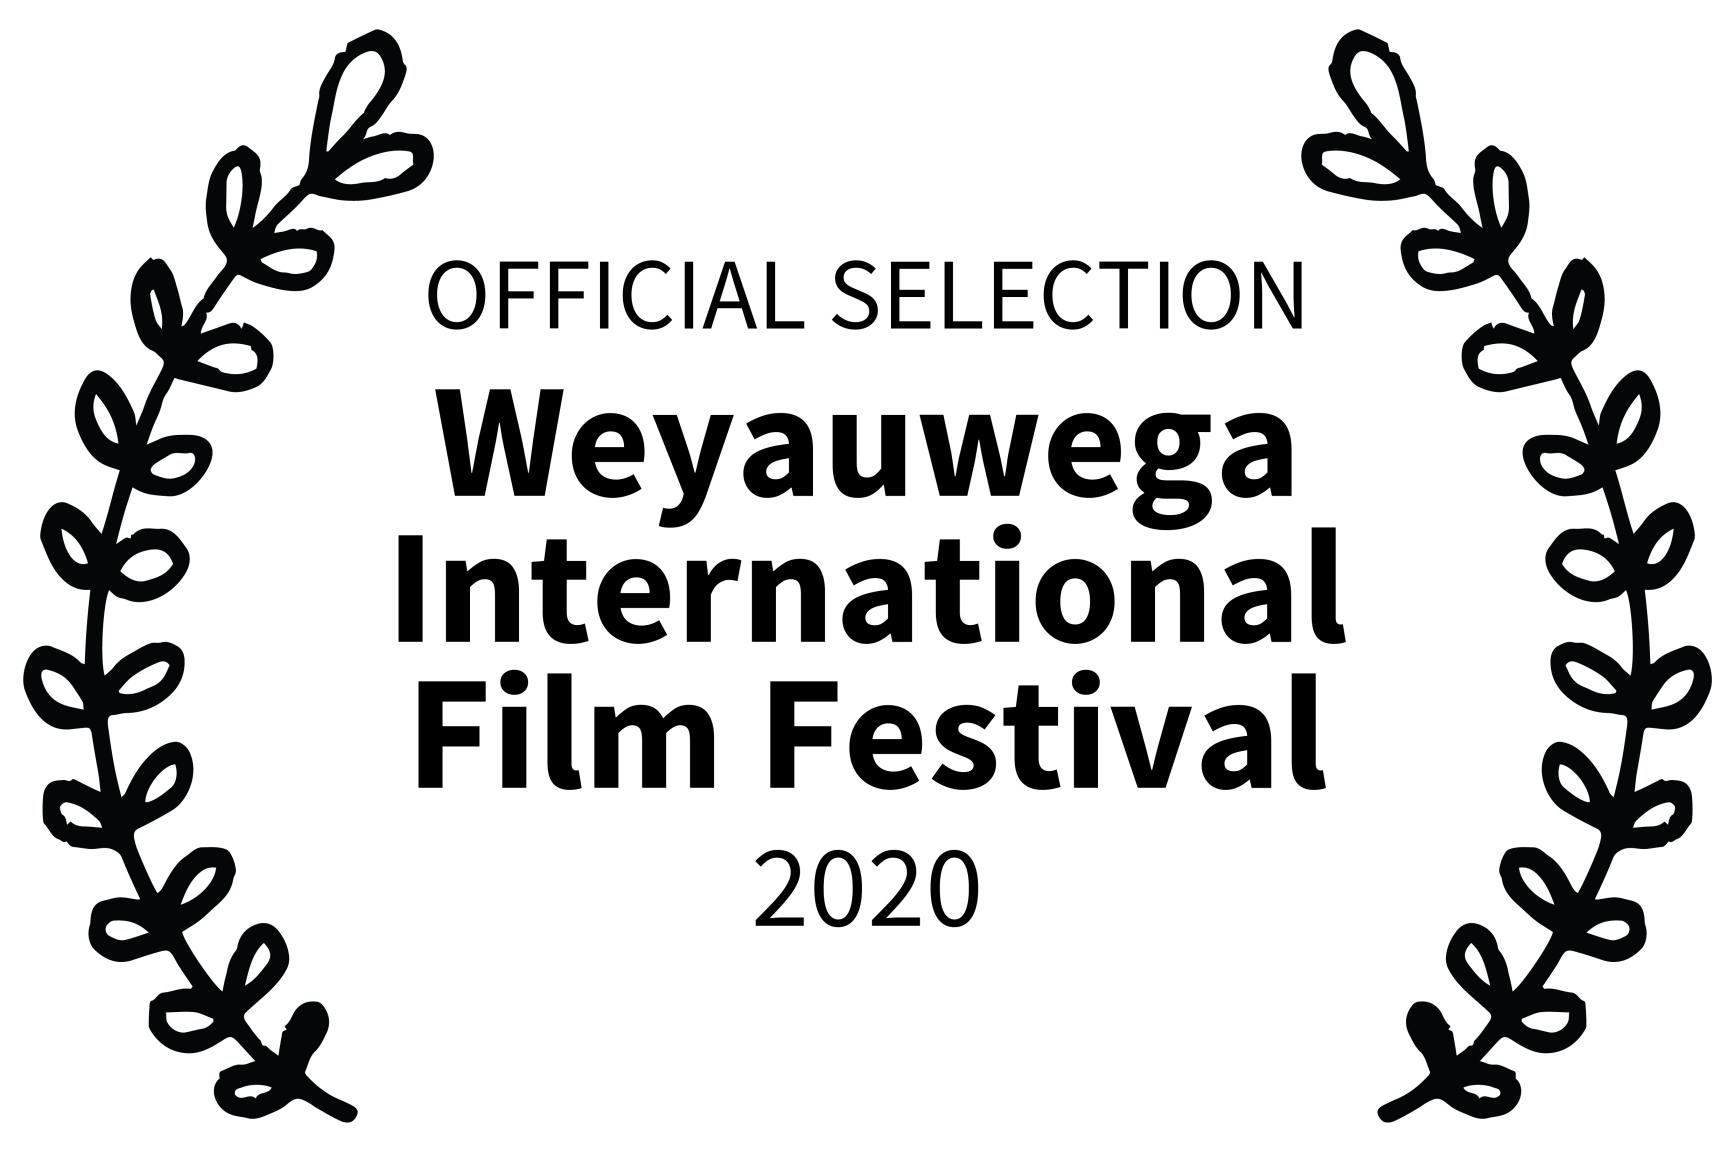 OFFICIAL-SELECTION---Weyauwega-International-Film-Festival---2020